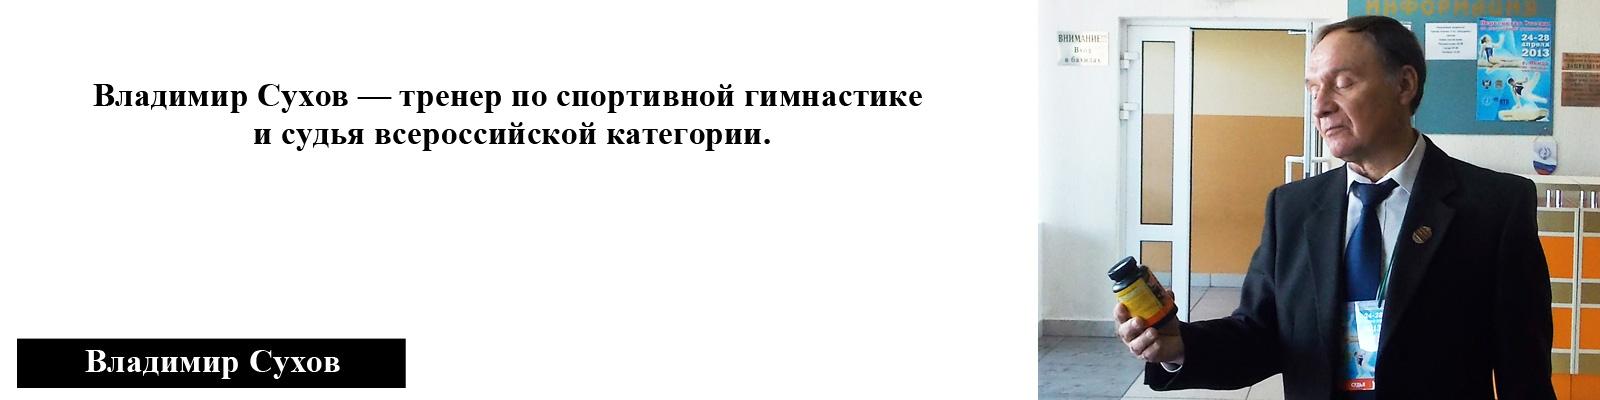 Сухов Гимнастика